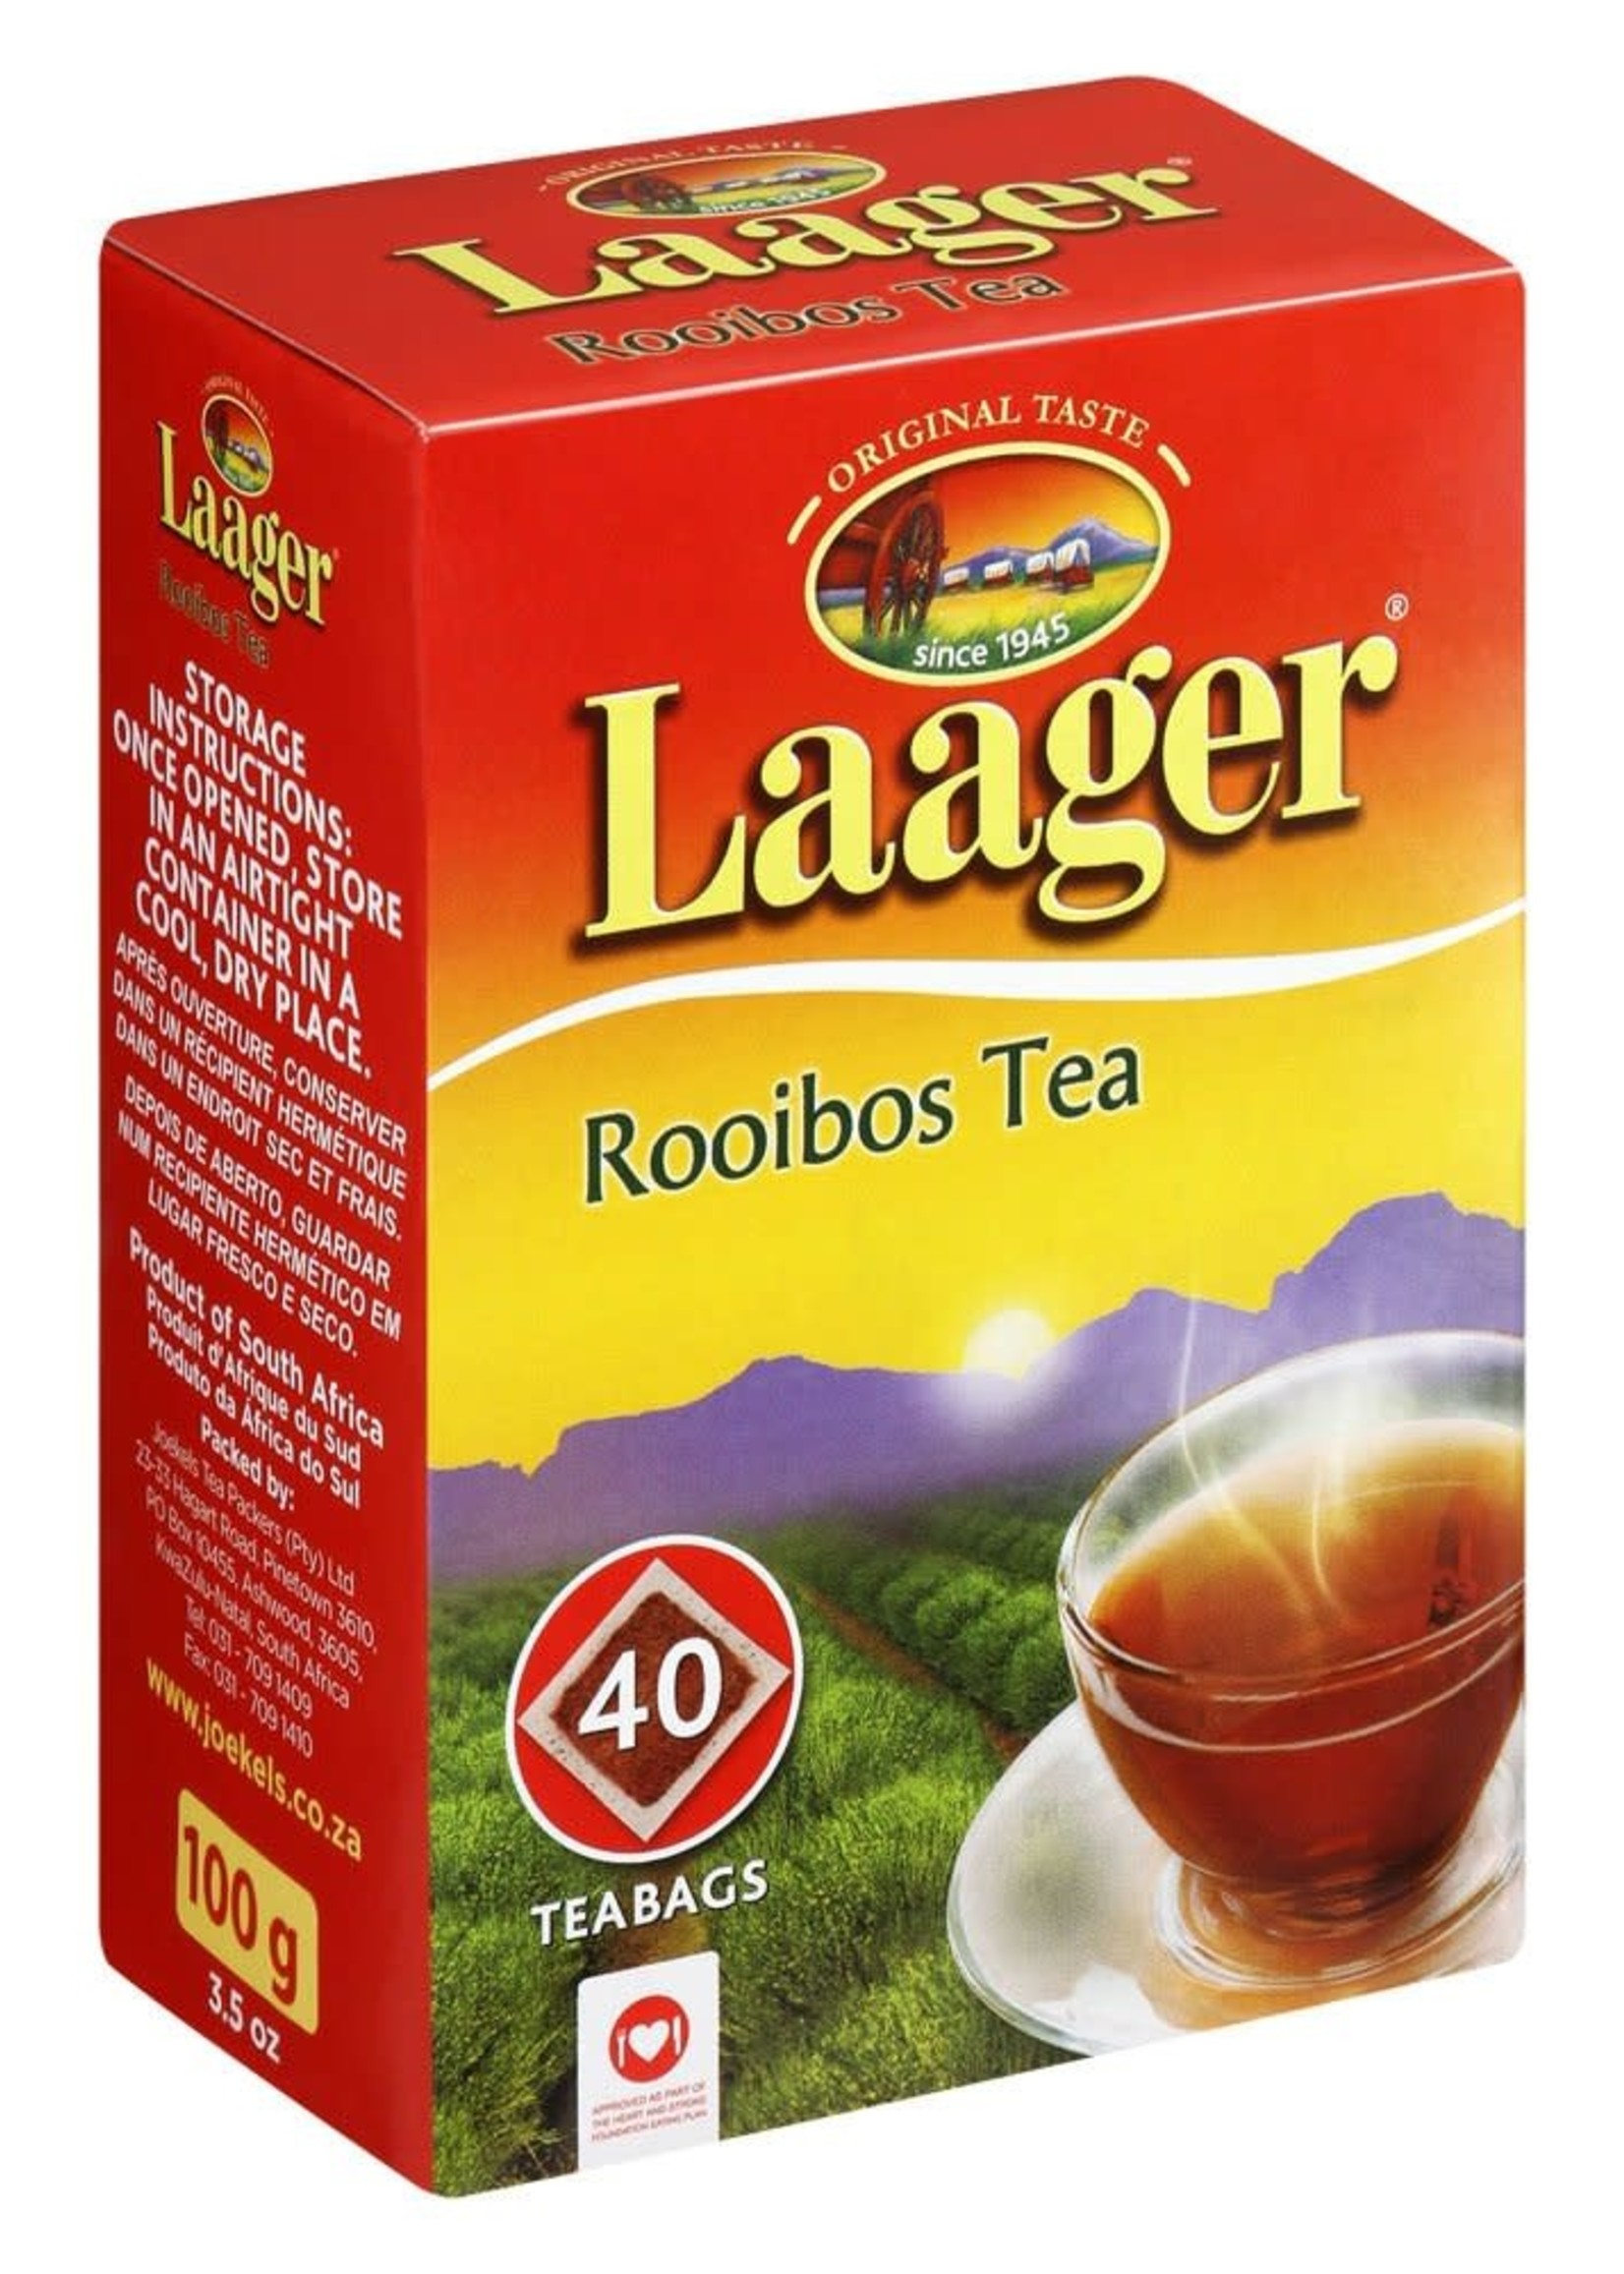 Laager Pure rooibos tea